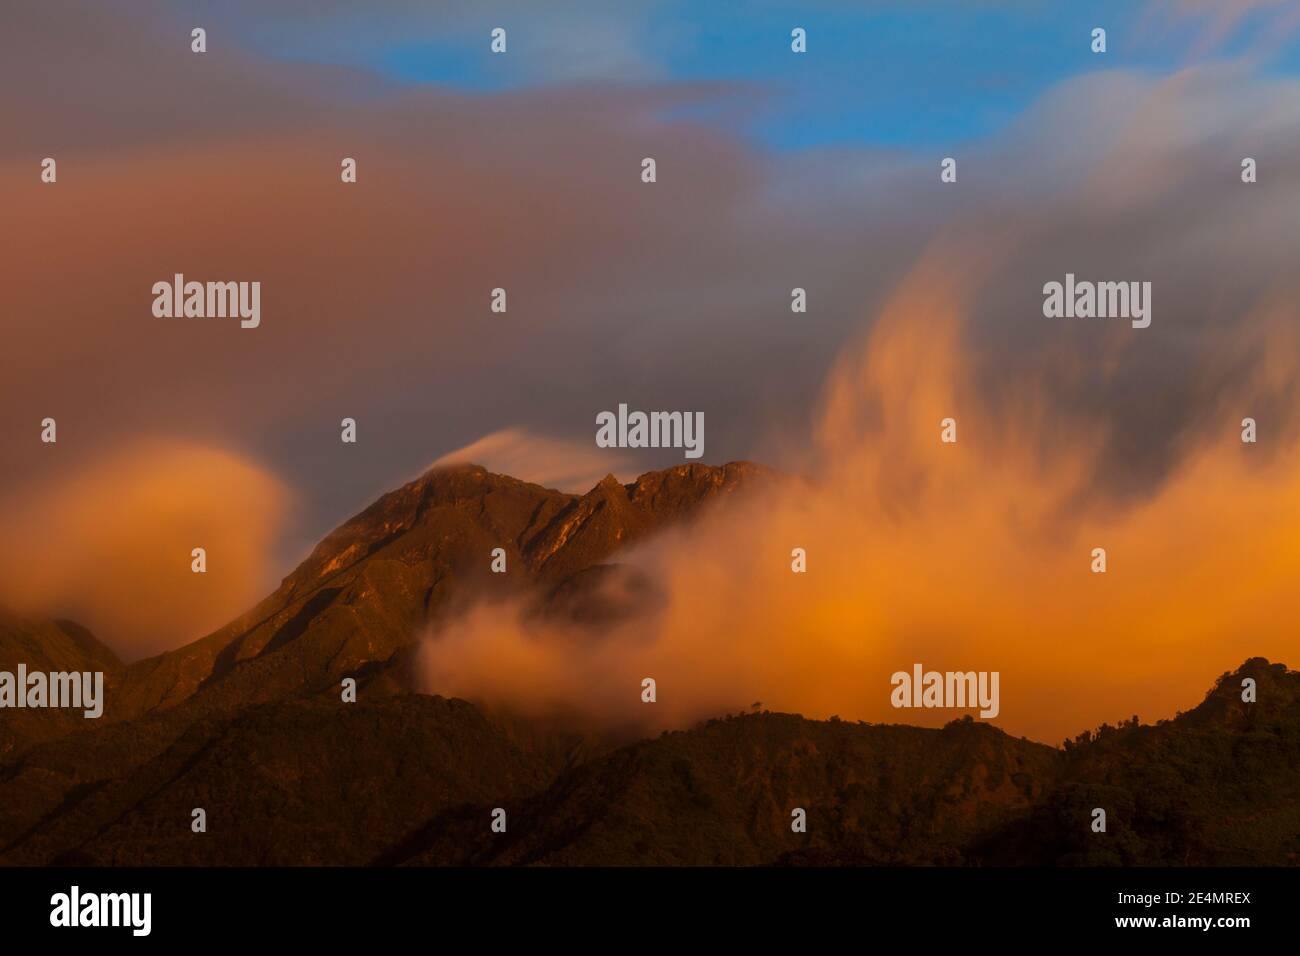 Letzten Abend Licht auf Volcan Baru, 3475 m, Provinz Chiriqui, Republik Panama. Stockfoto